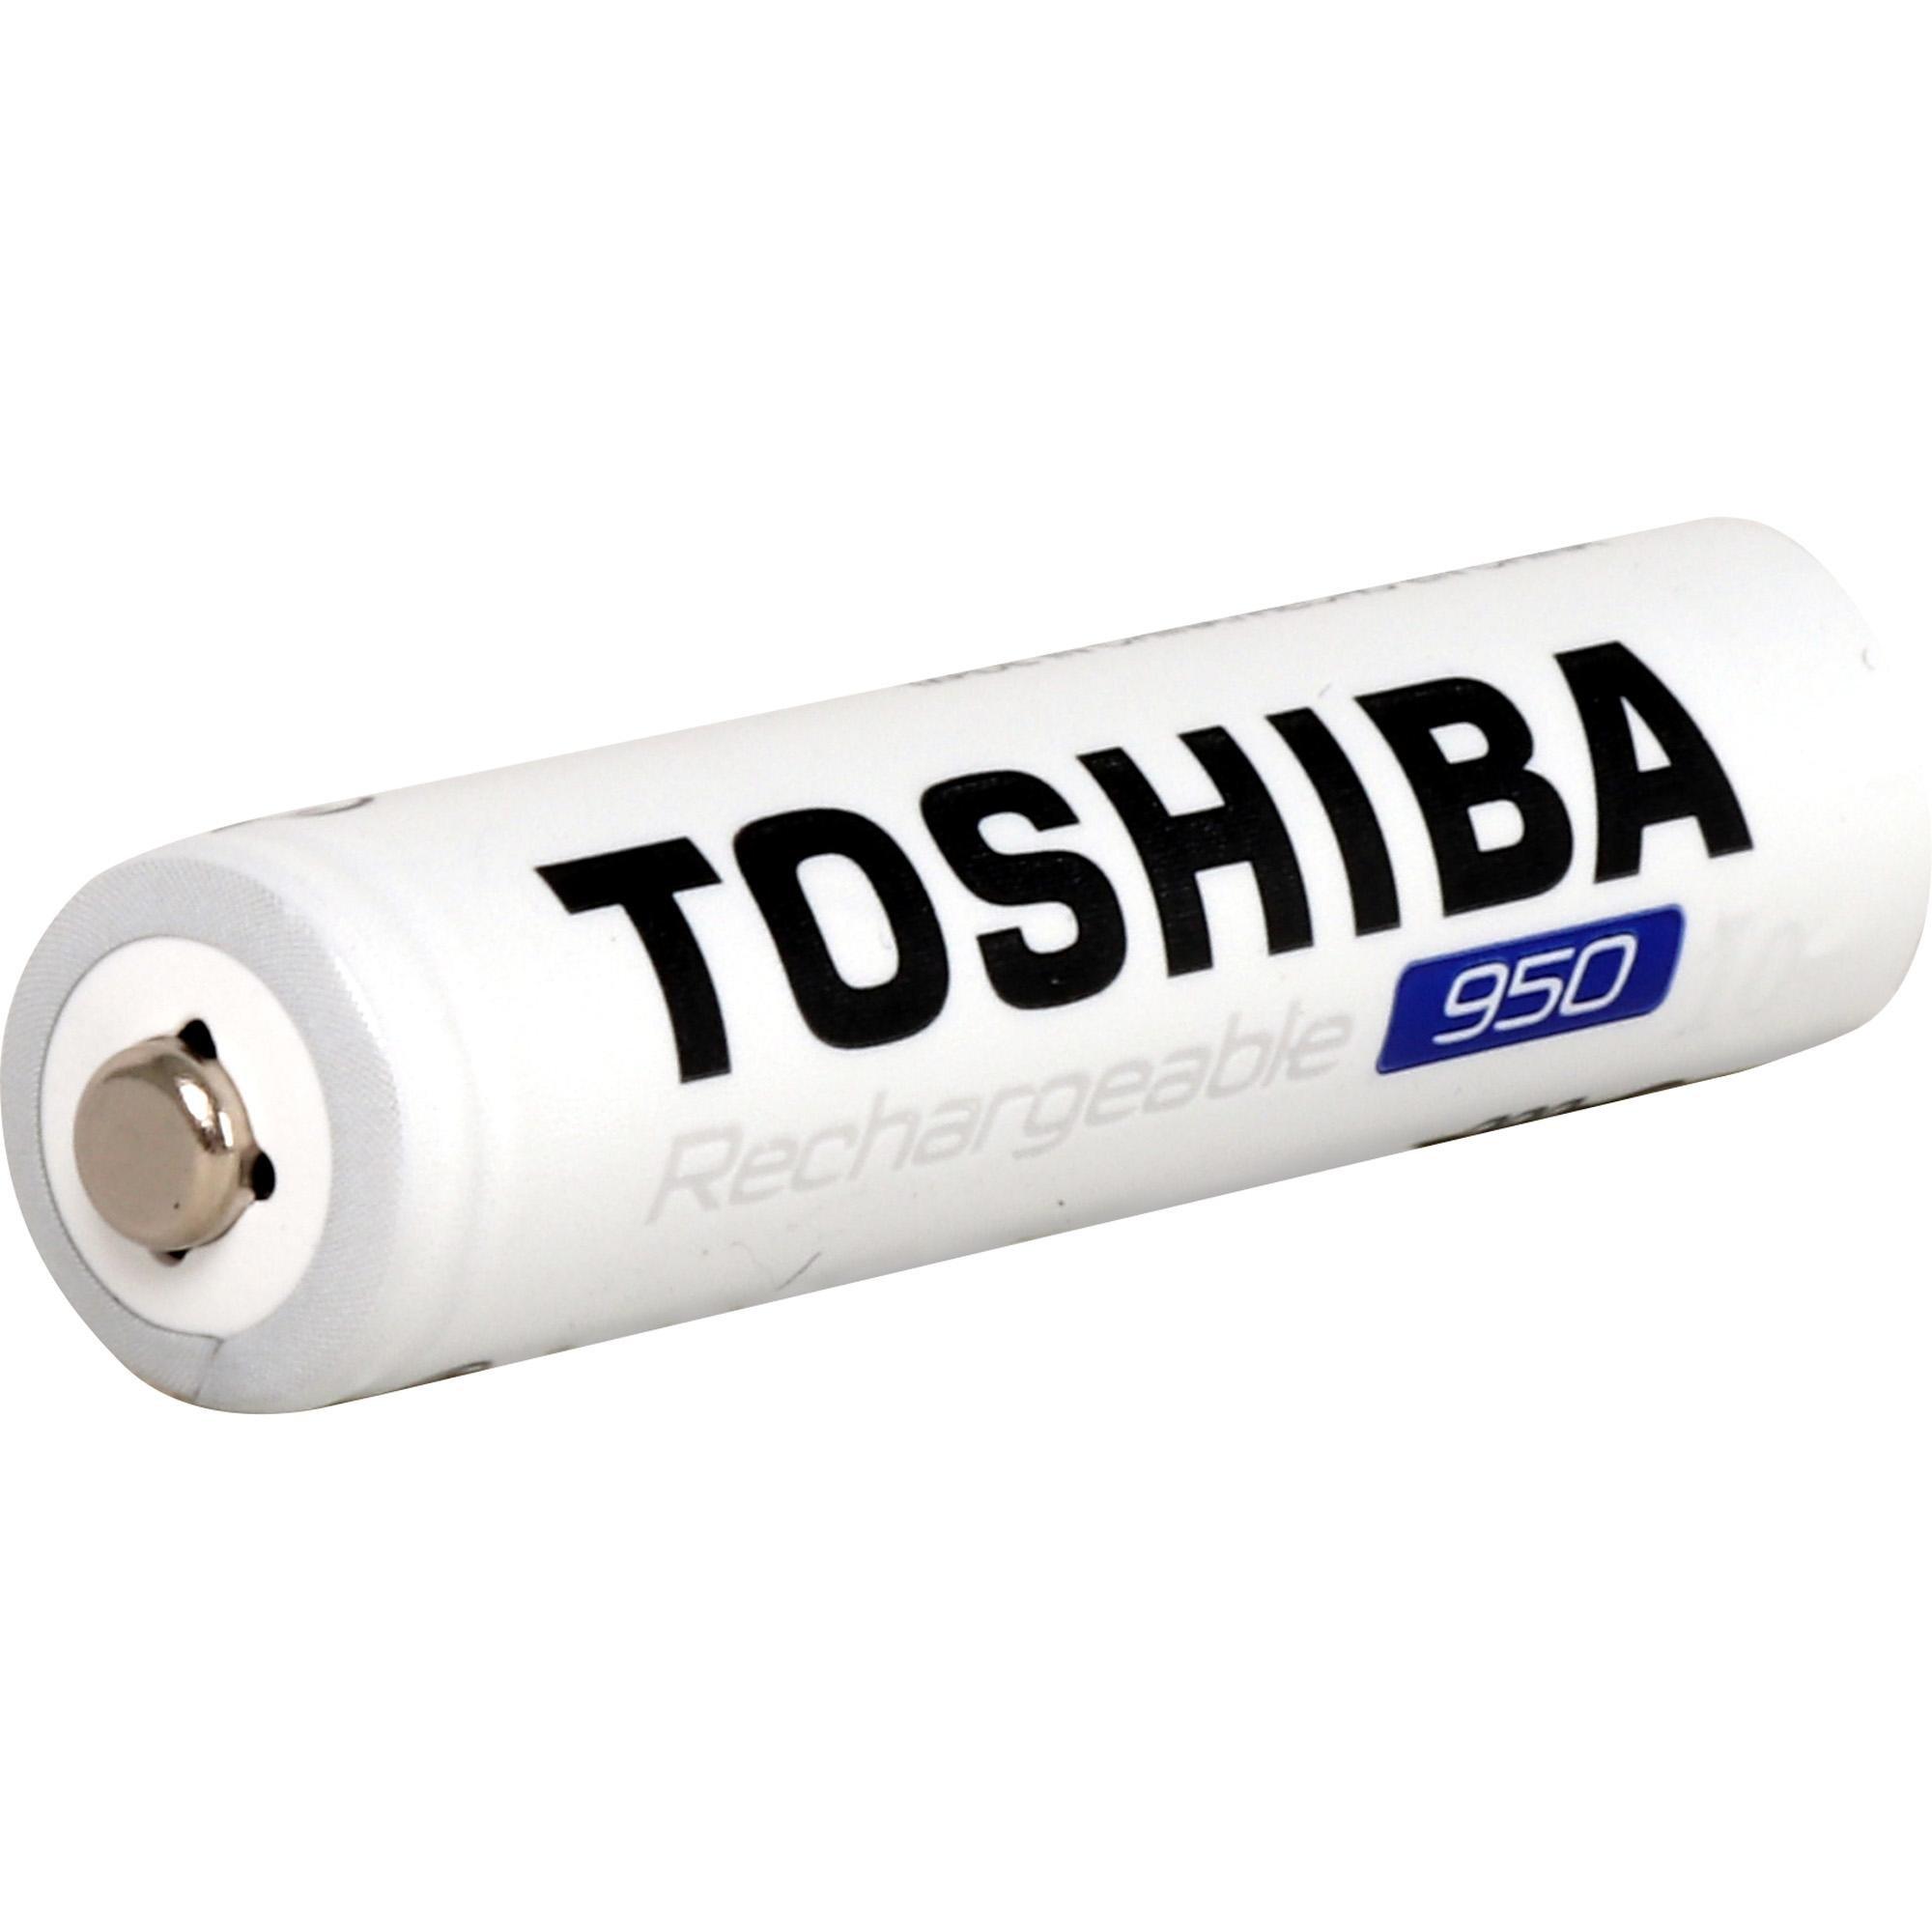 2 Pilhas Recarregáveis Toshiba AAA Palito 950mAh TNH-03GAE BP-2C 1,2v